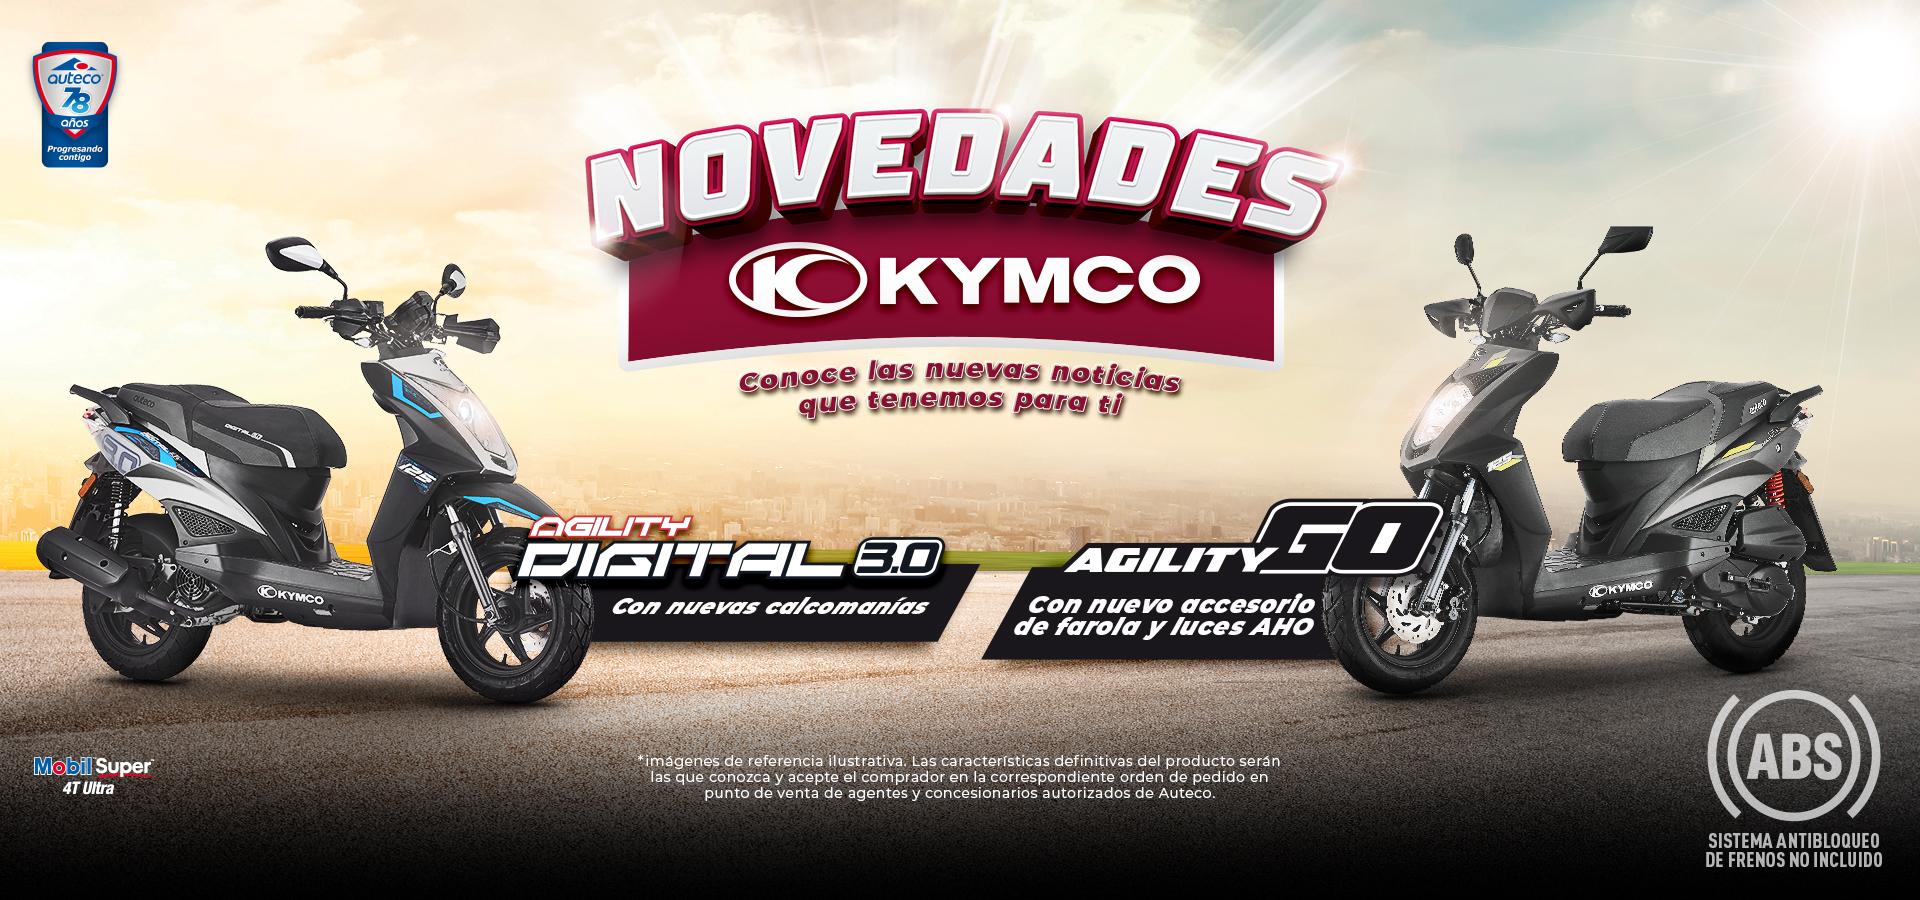 Novedades Kymco